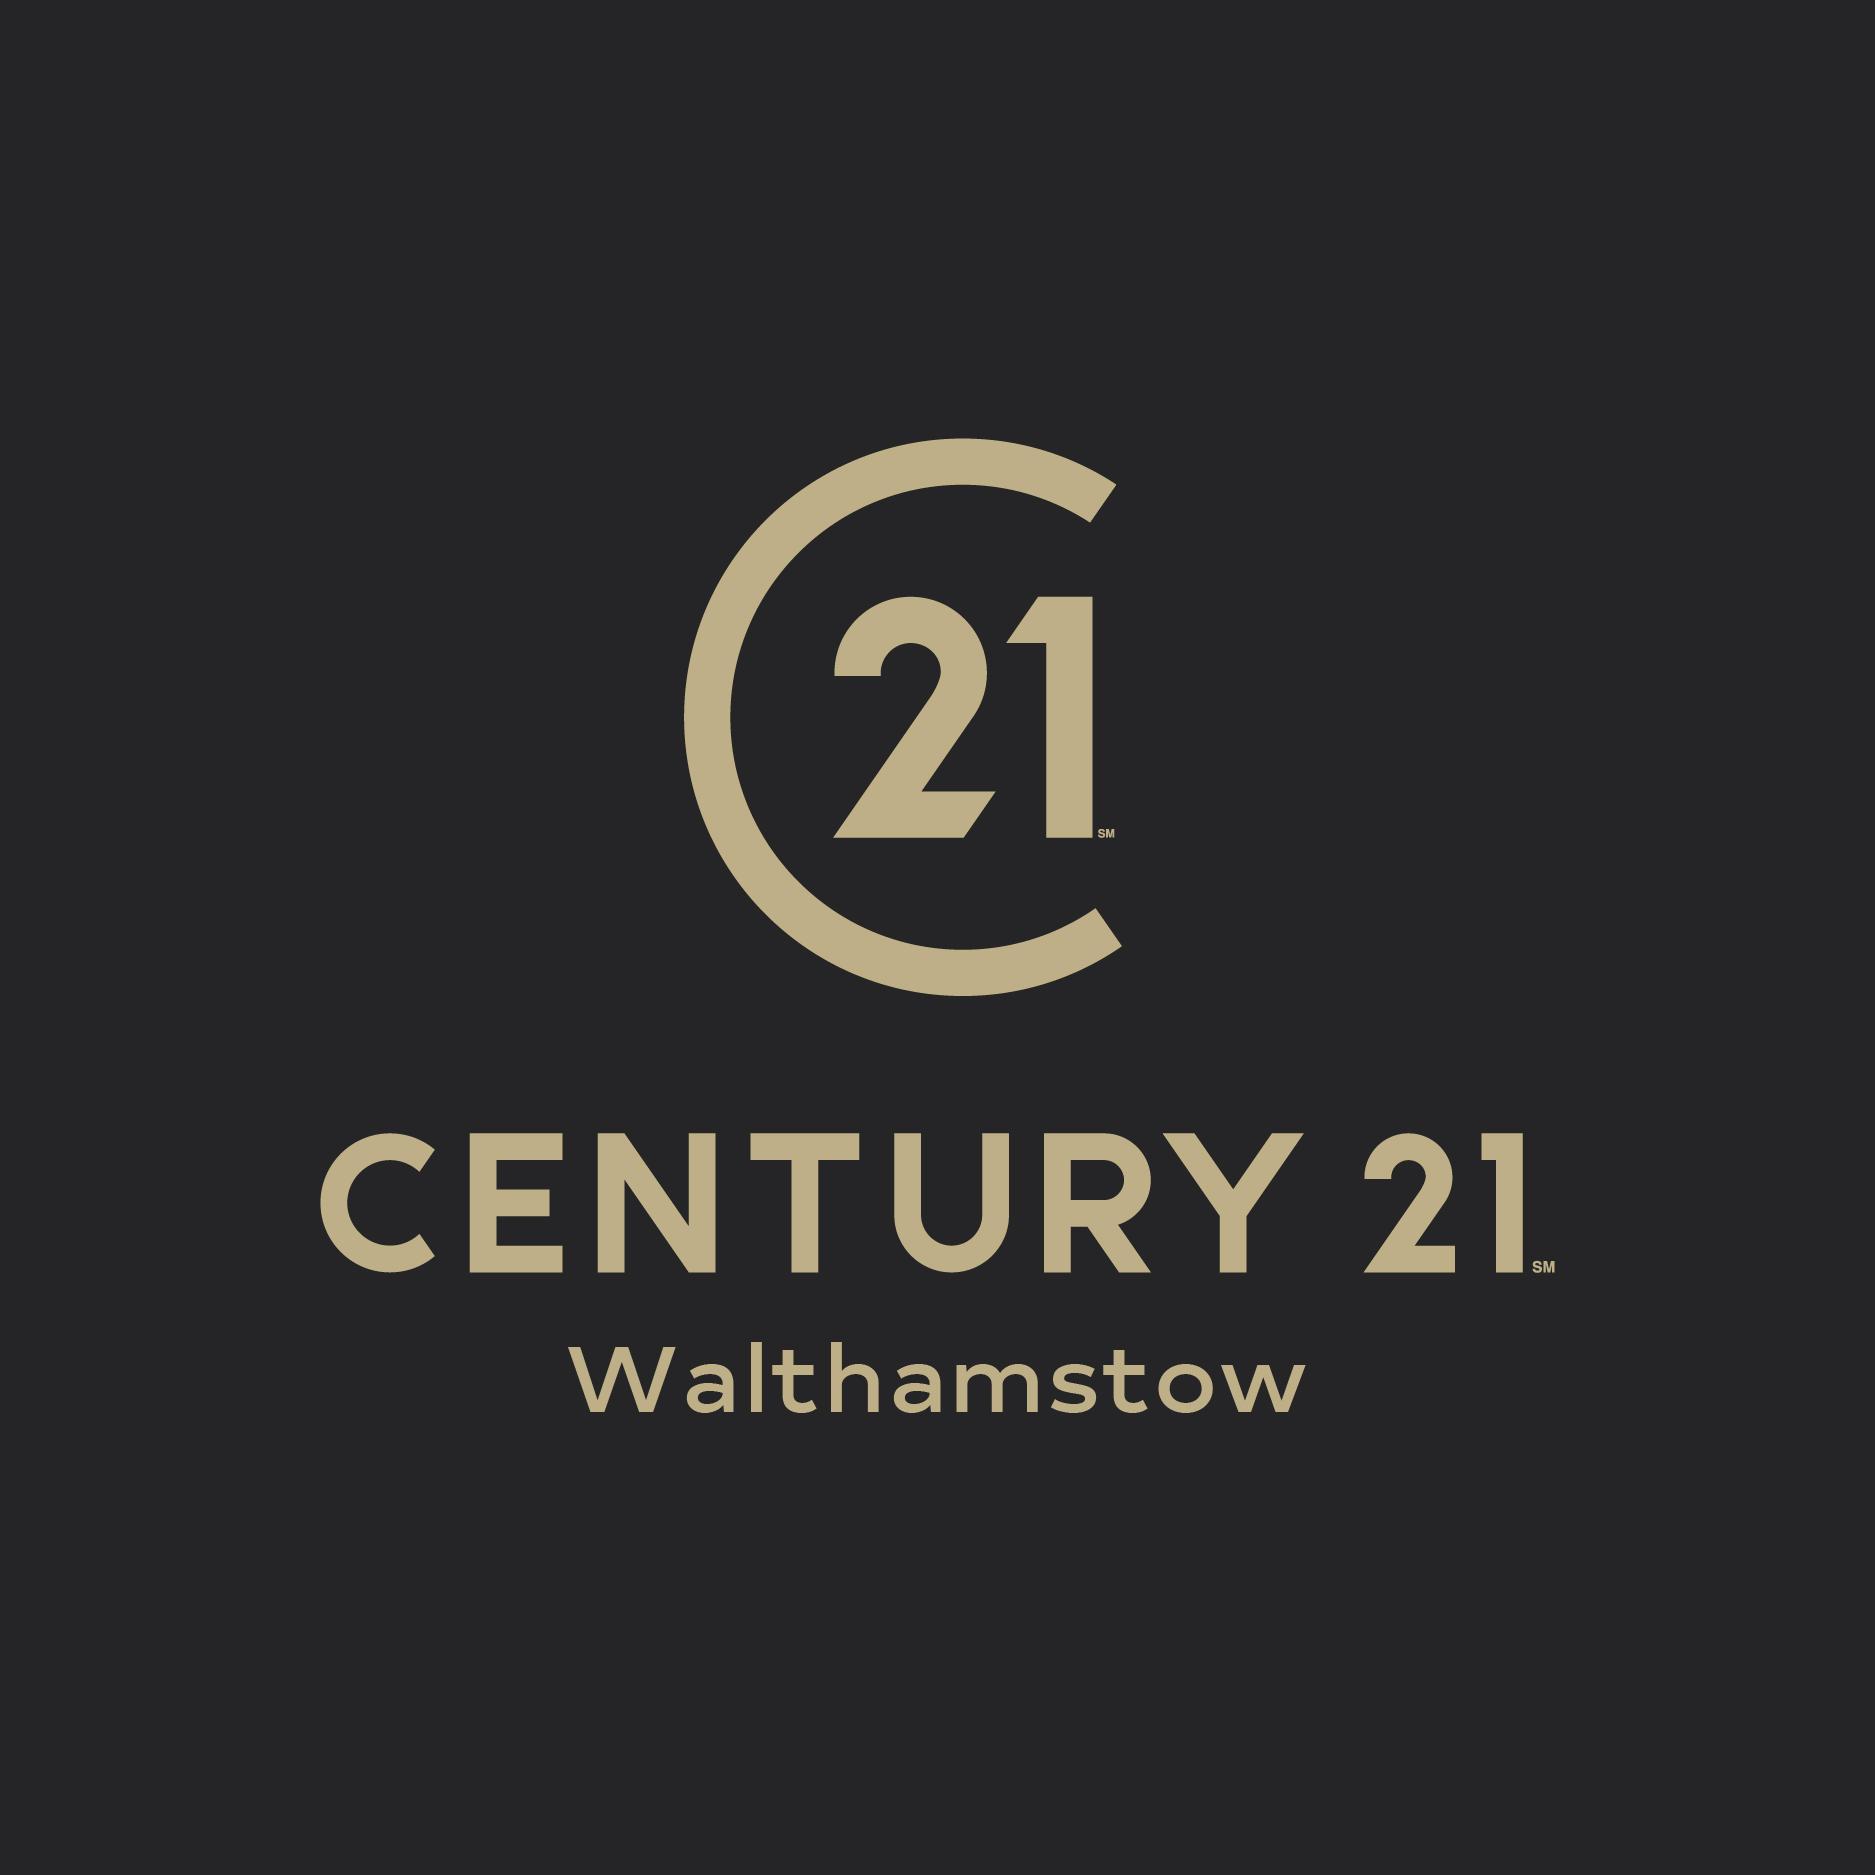 Century 21 - Walthamstow